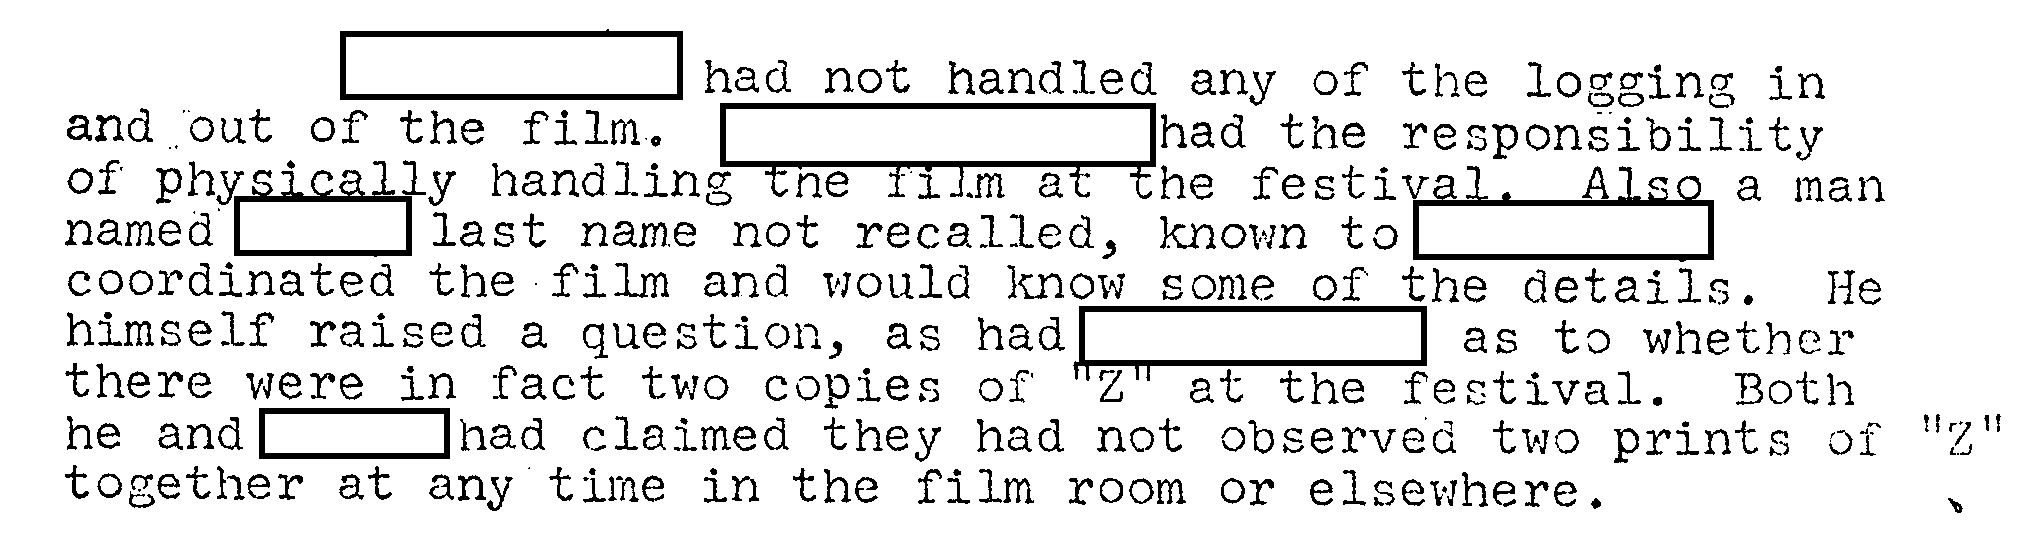 FBI-Valenti-Werethere2copiesofZ